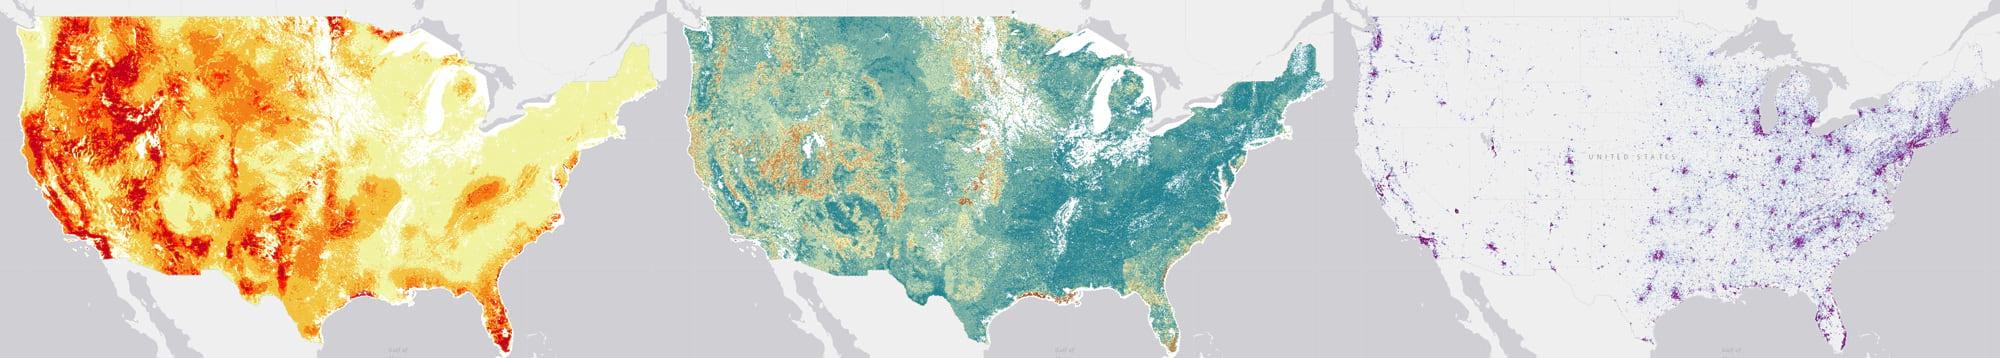 three fire maps from USFS